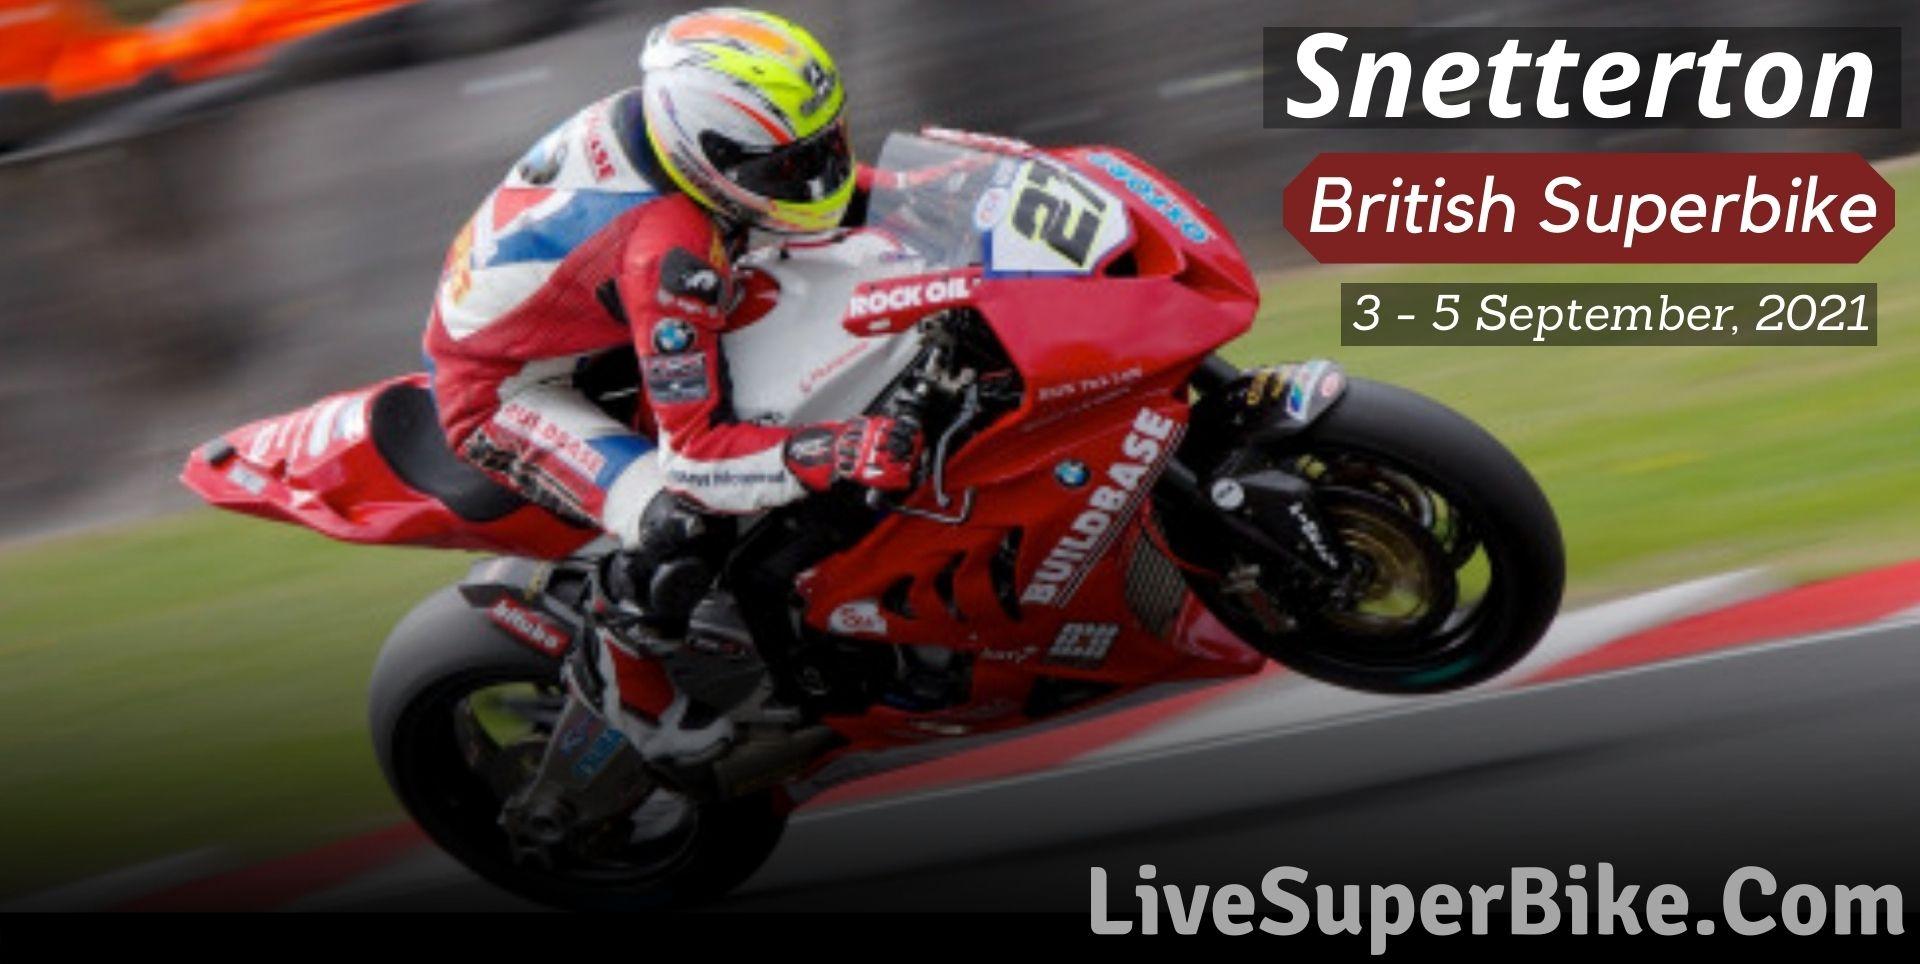 Snetterton British Superbike Live Stream 2021